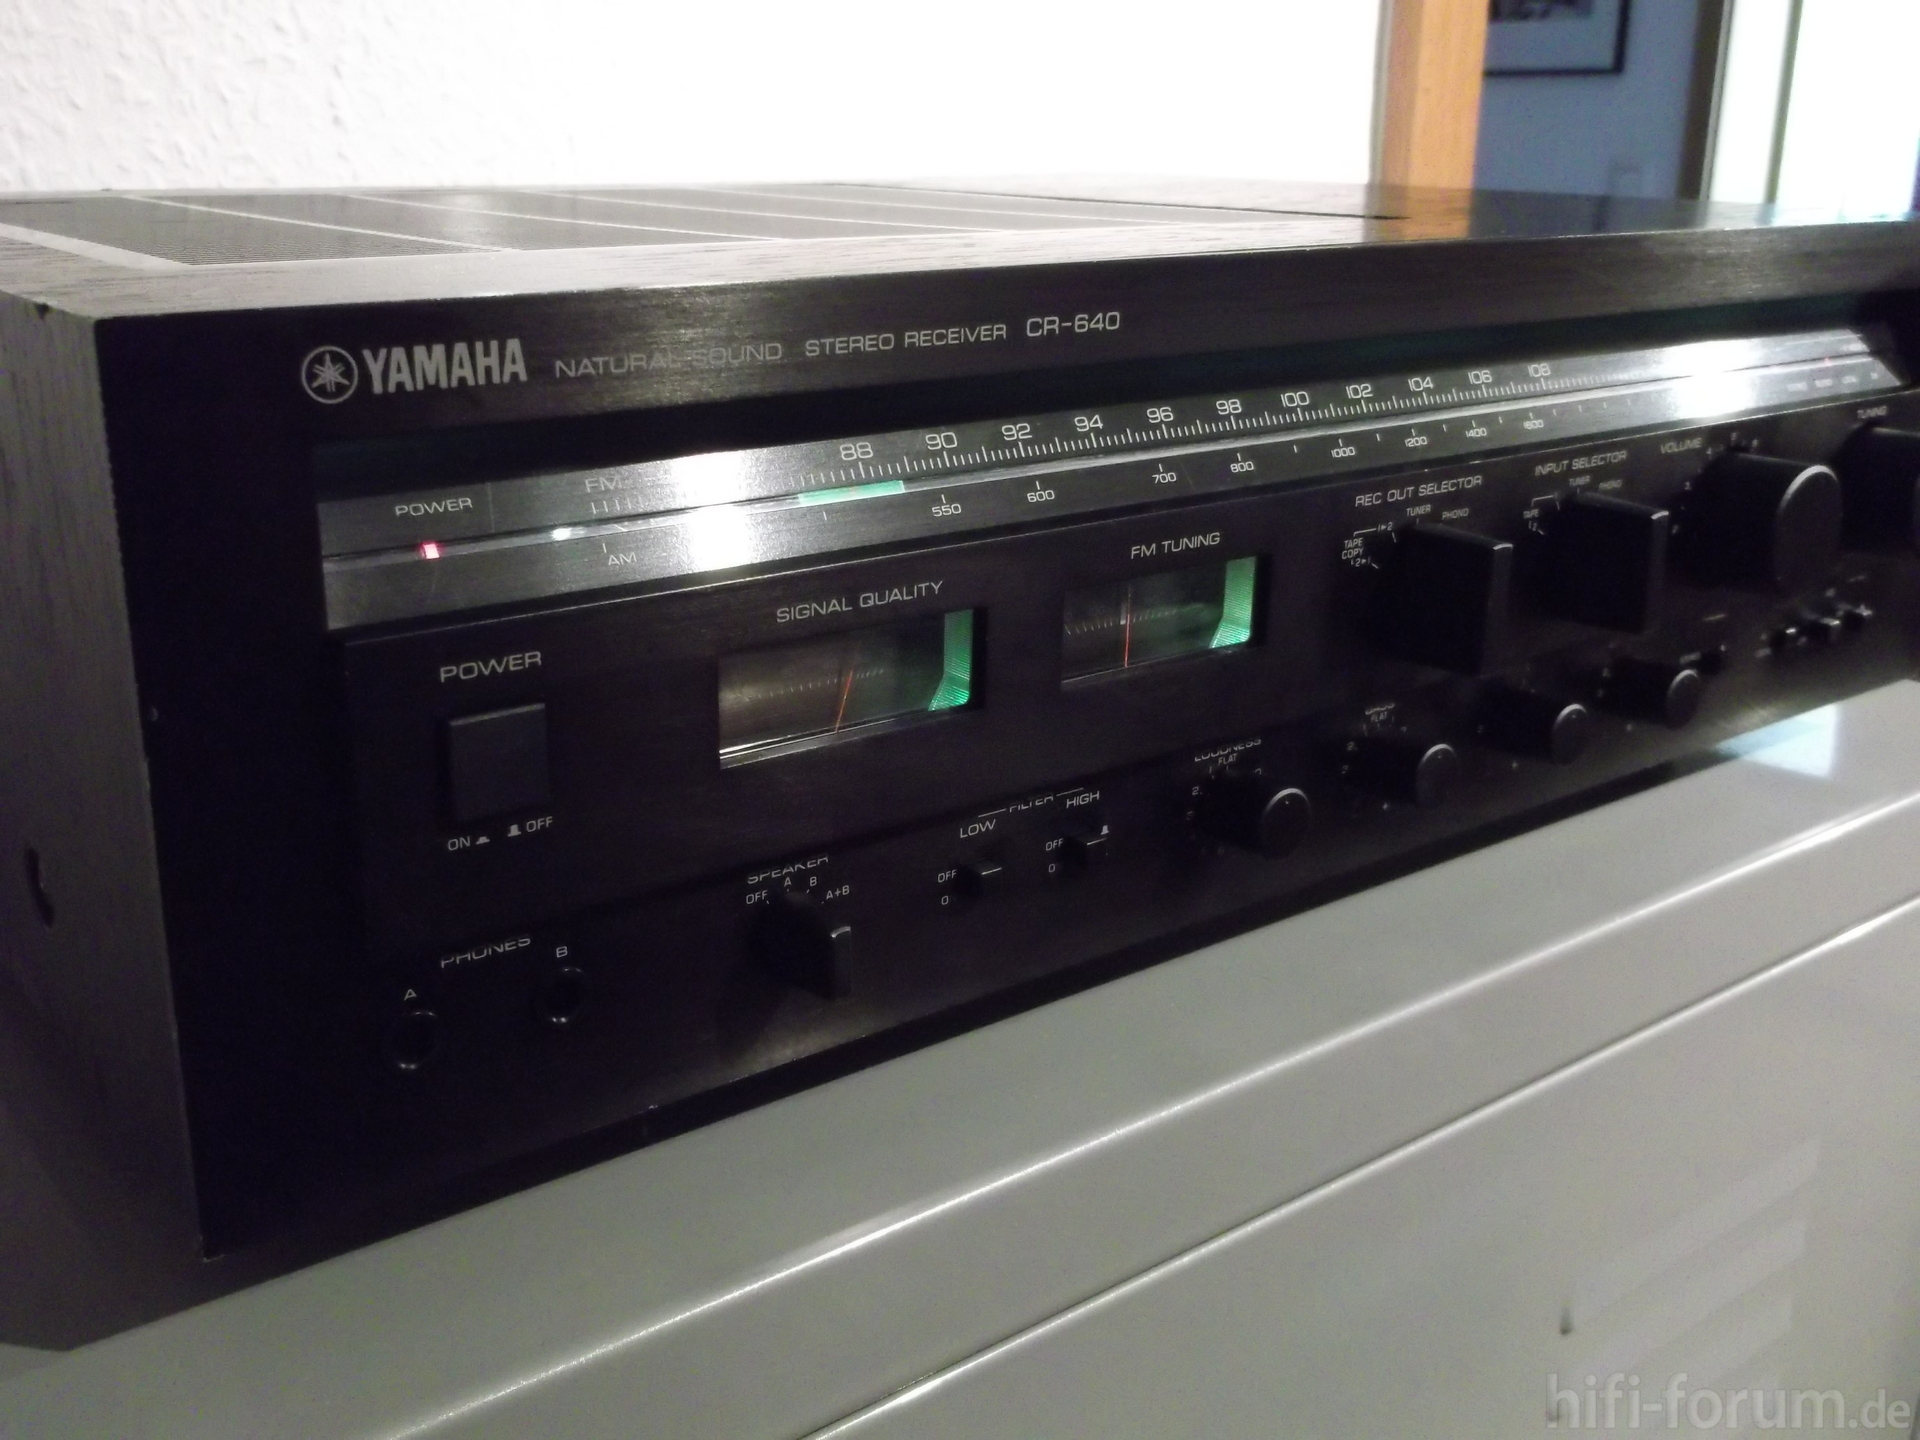 Yamaha Cr Stereo Receiver